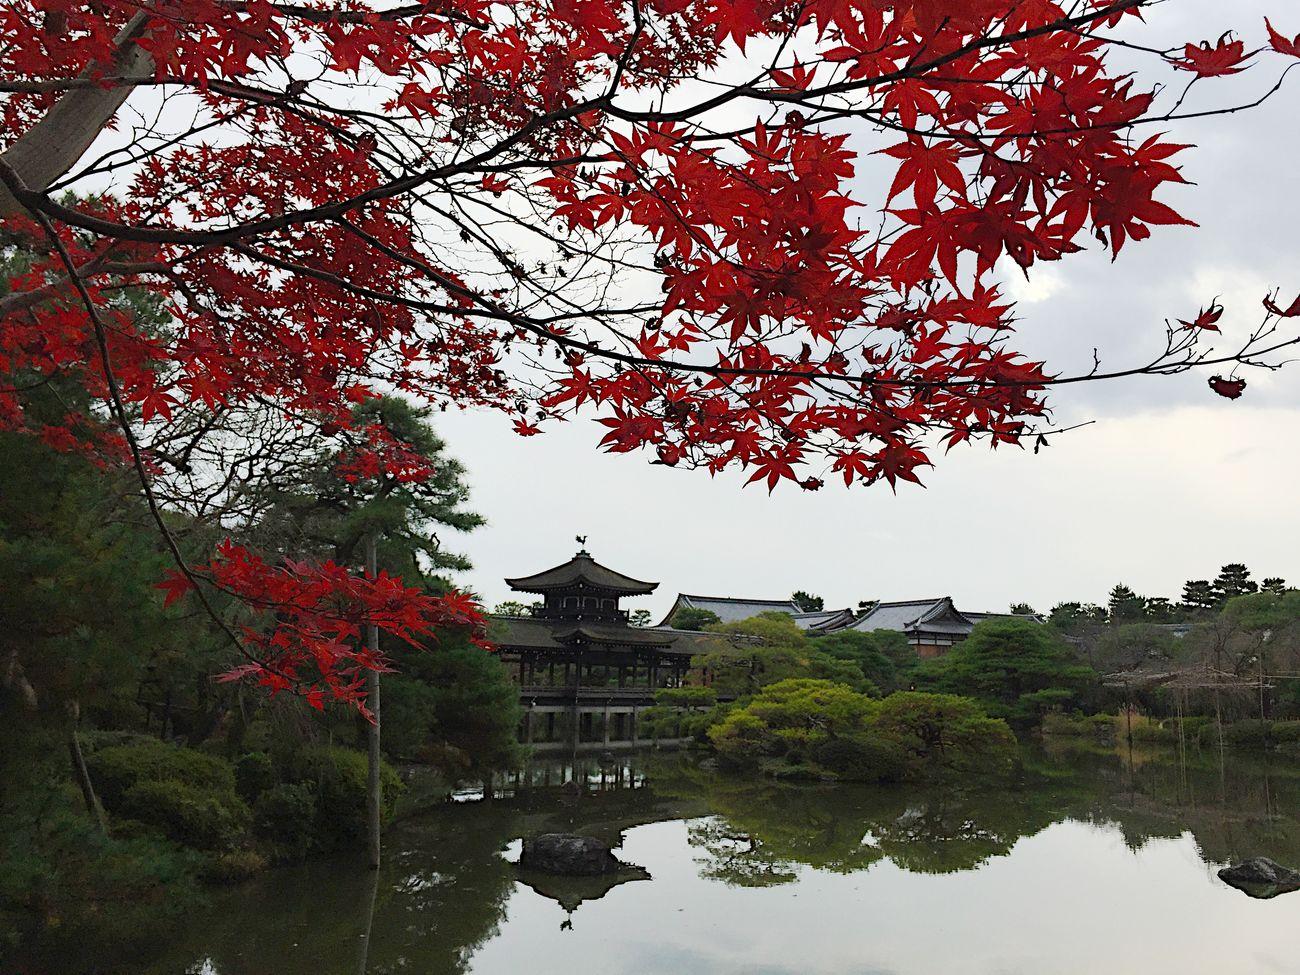 Kyoto 平安神宮 神苑 紅葉 もみじ